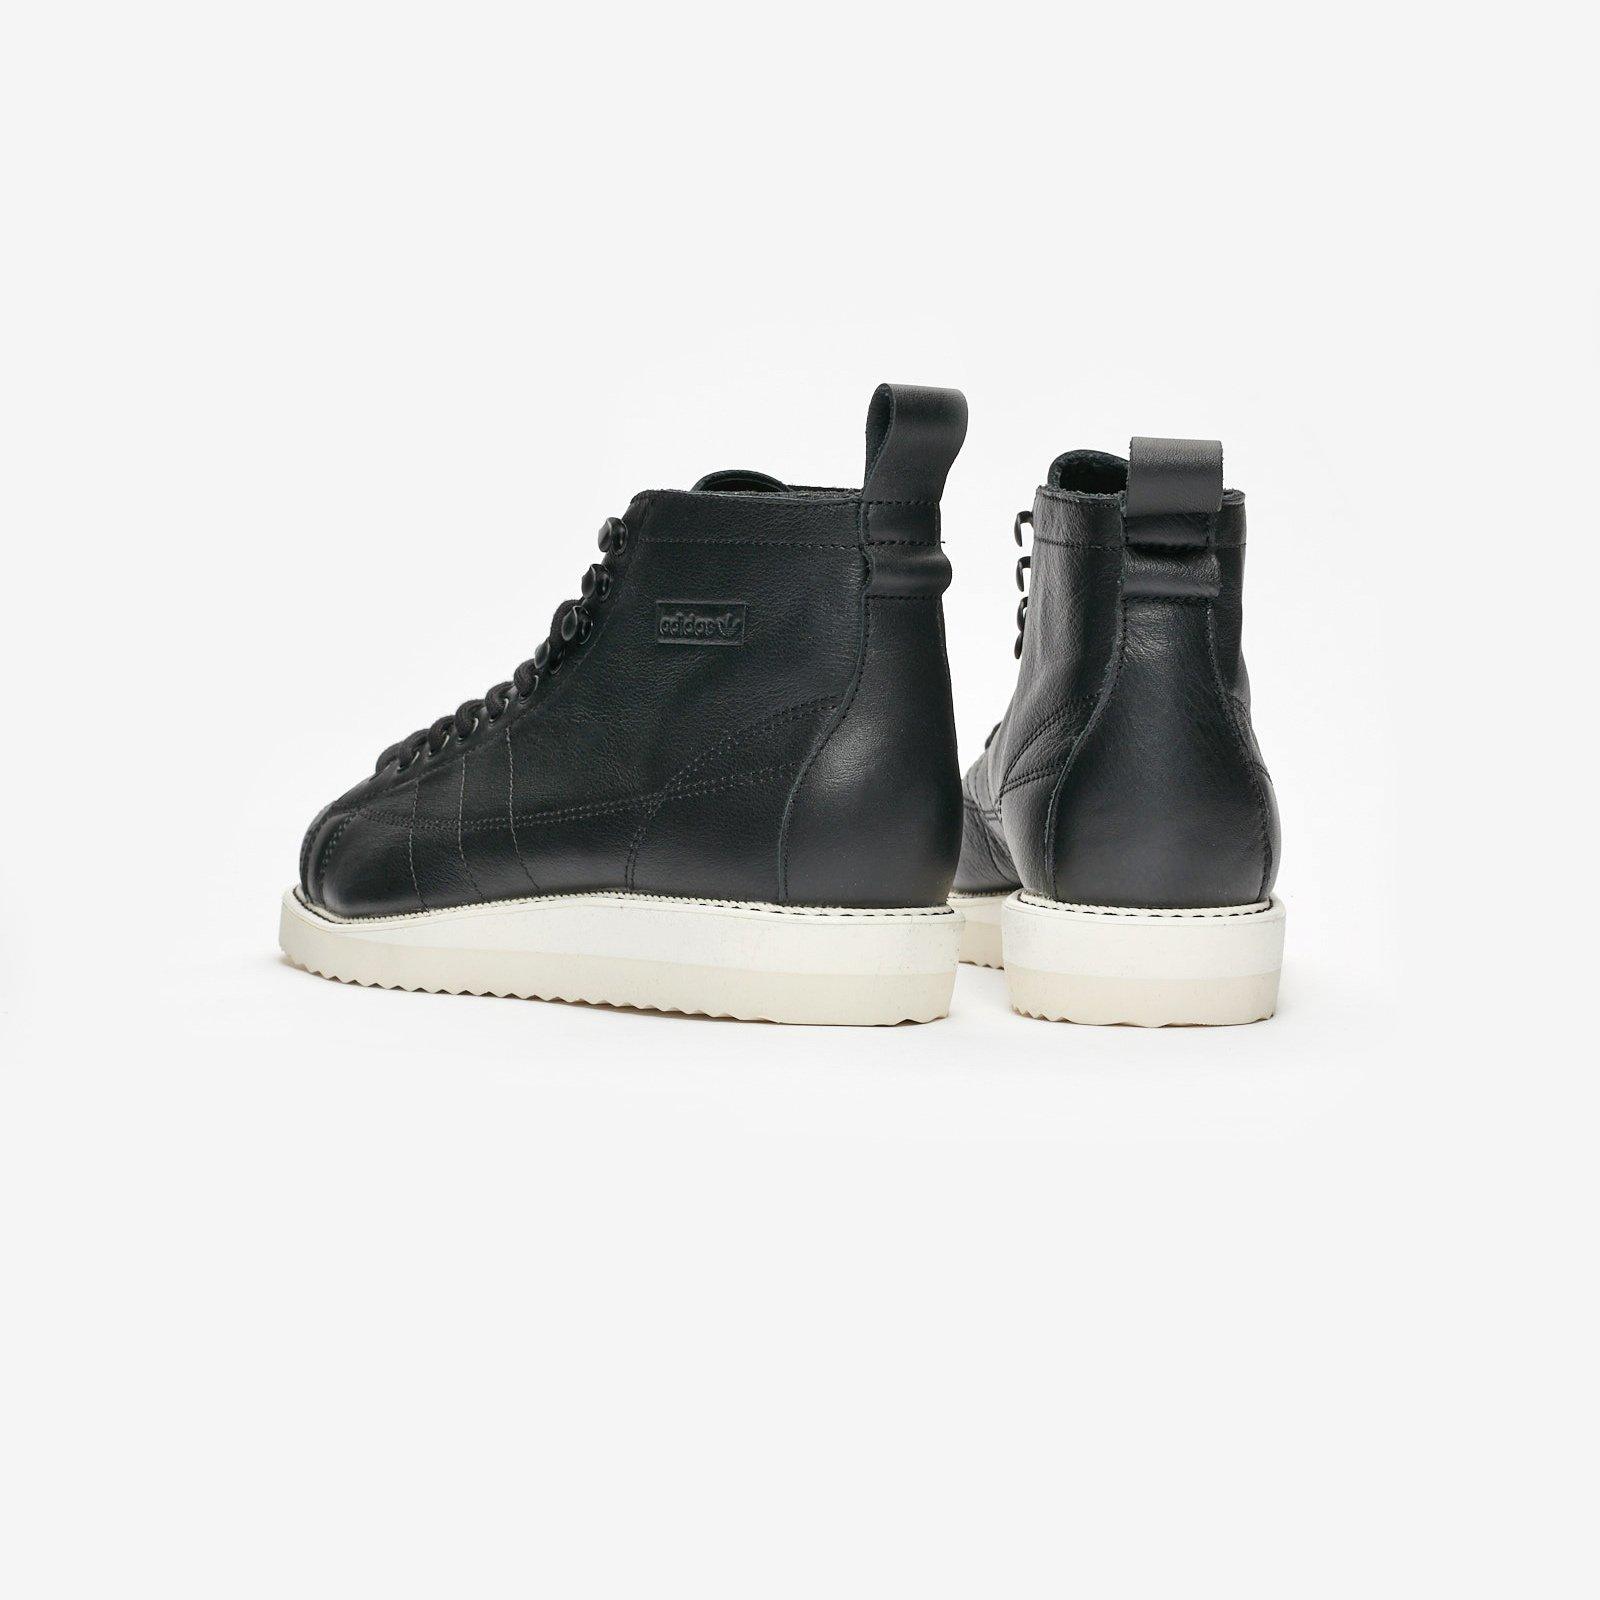 adidas Superstar Boot W - Aq1213